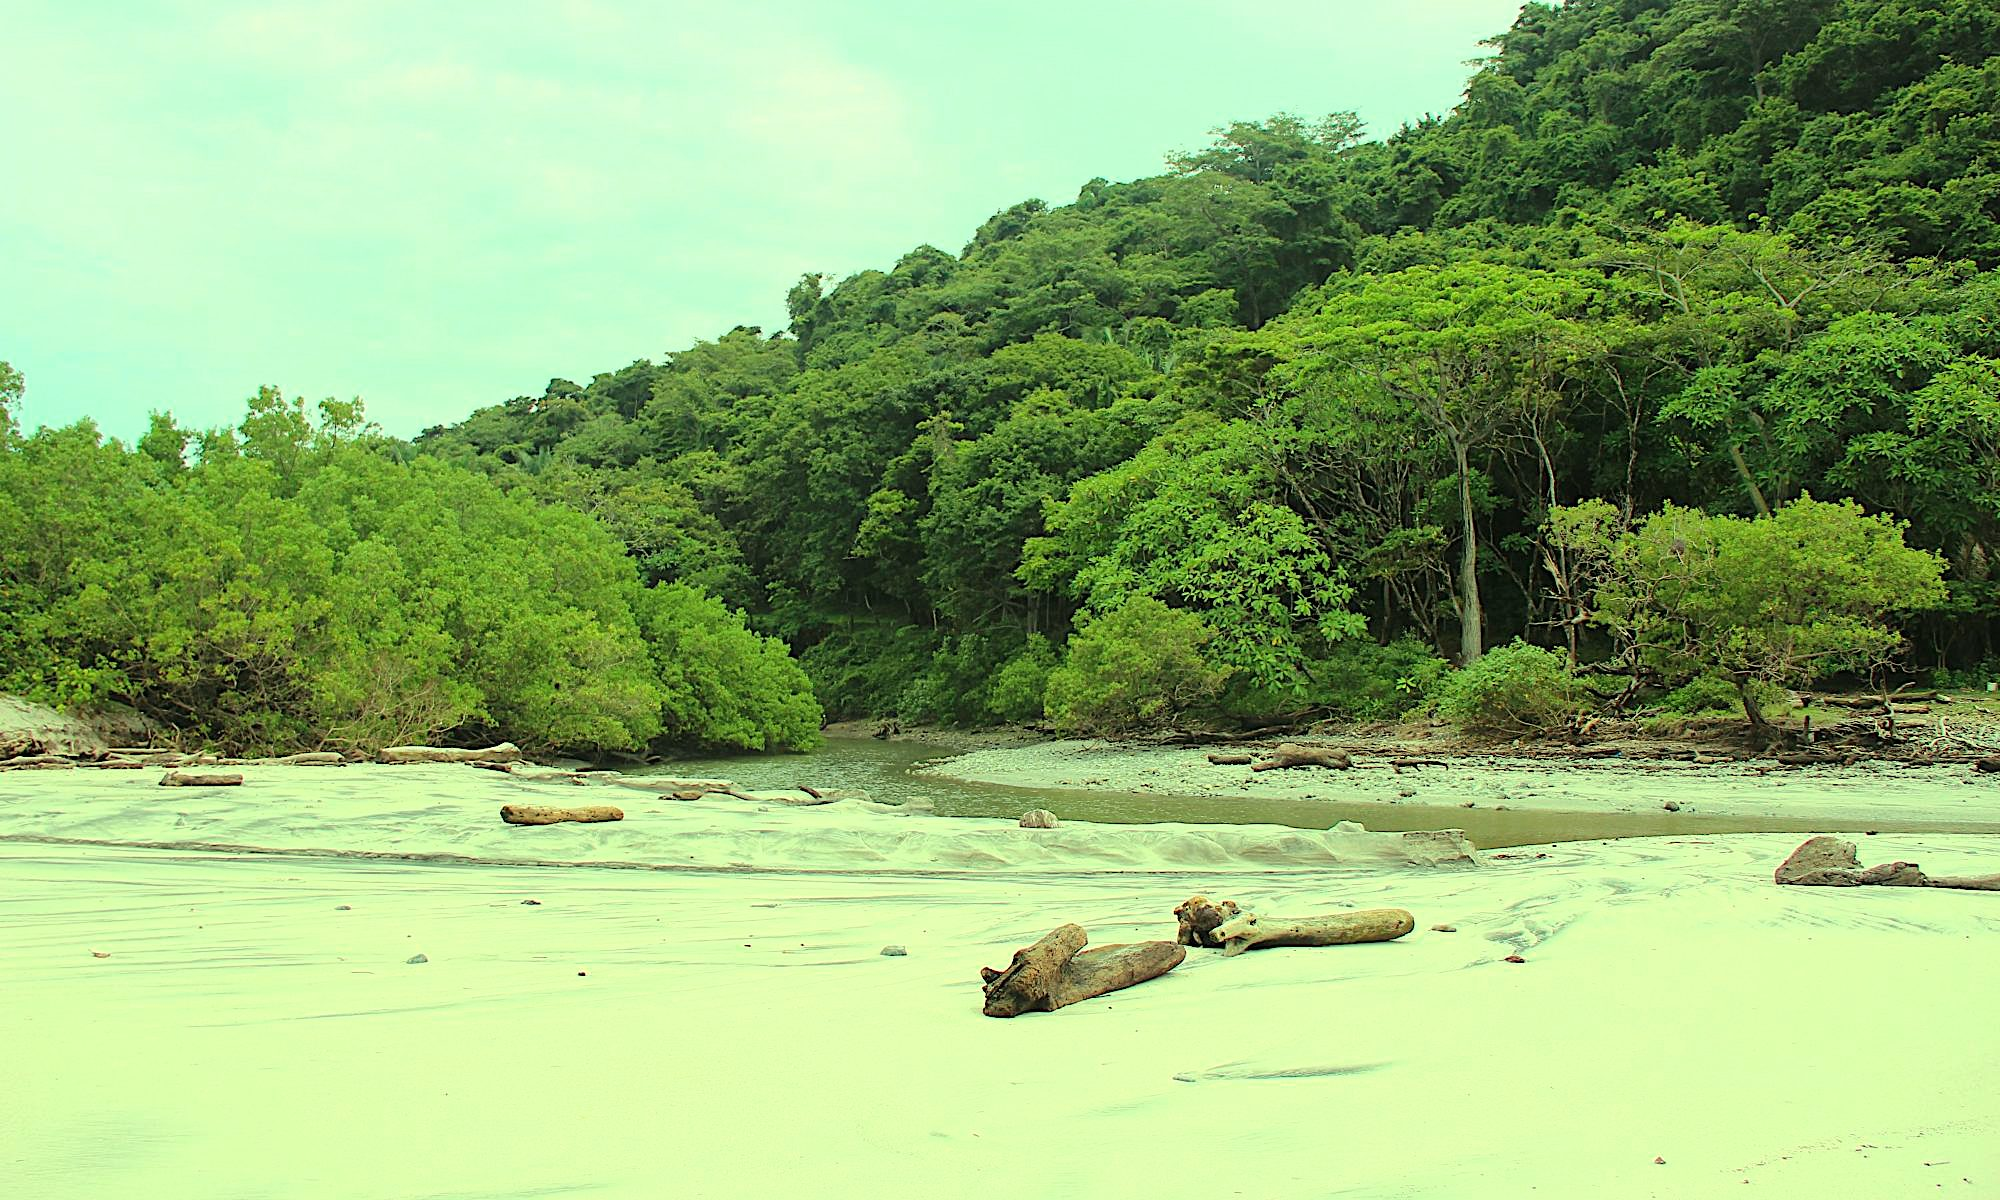 Playa an der Pazifiküste Costa Rica